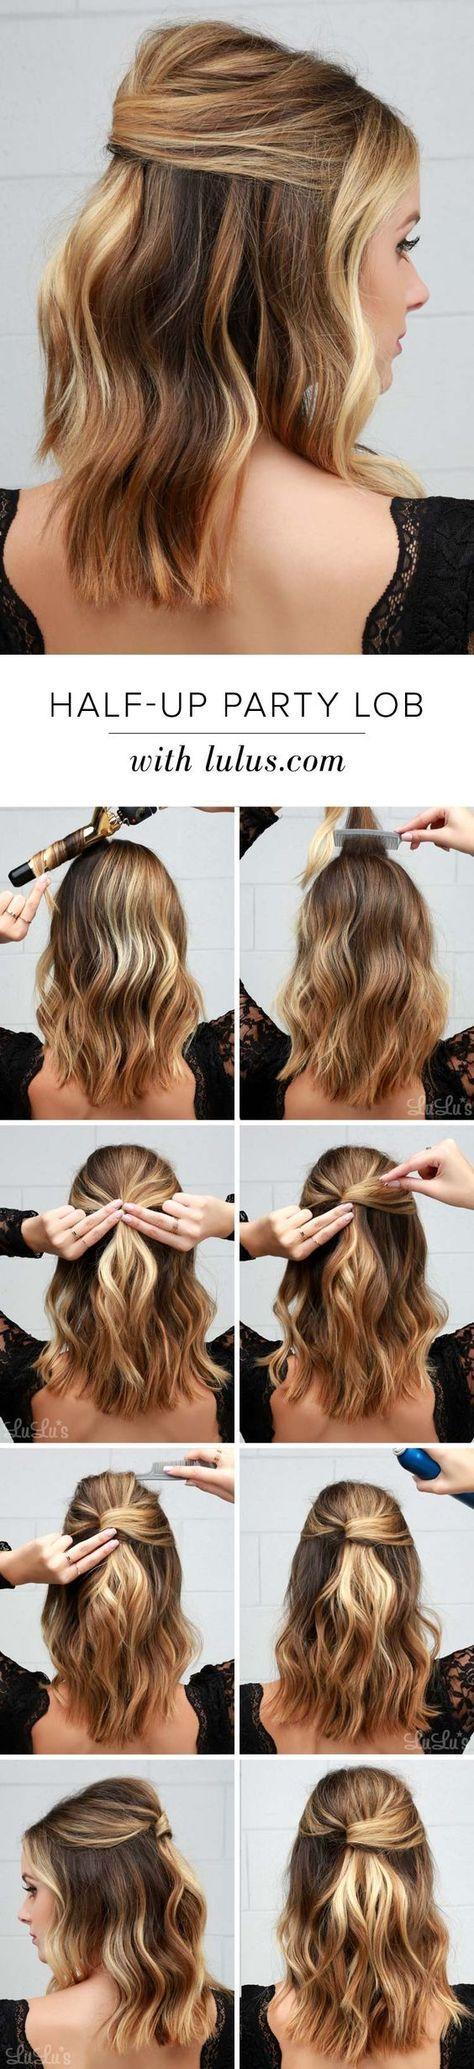 Lulus HowTo HalfUp Party Lob Lob Hair style and Bridesmaid hair